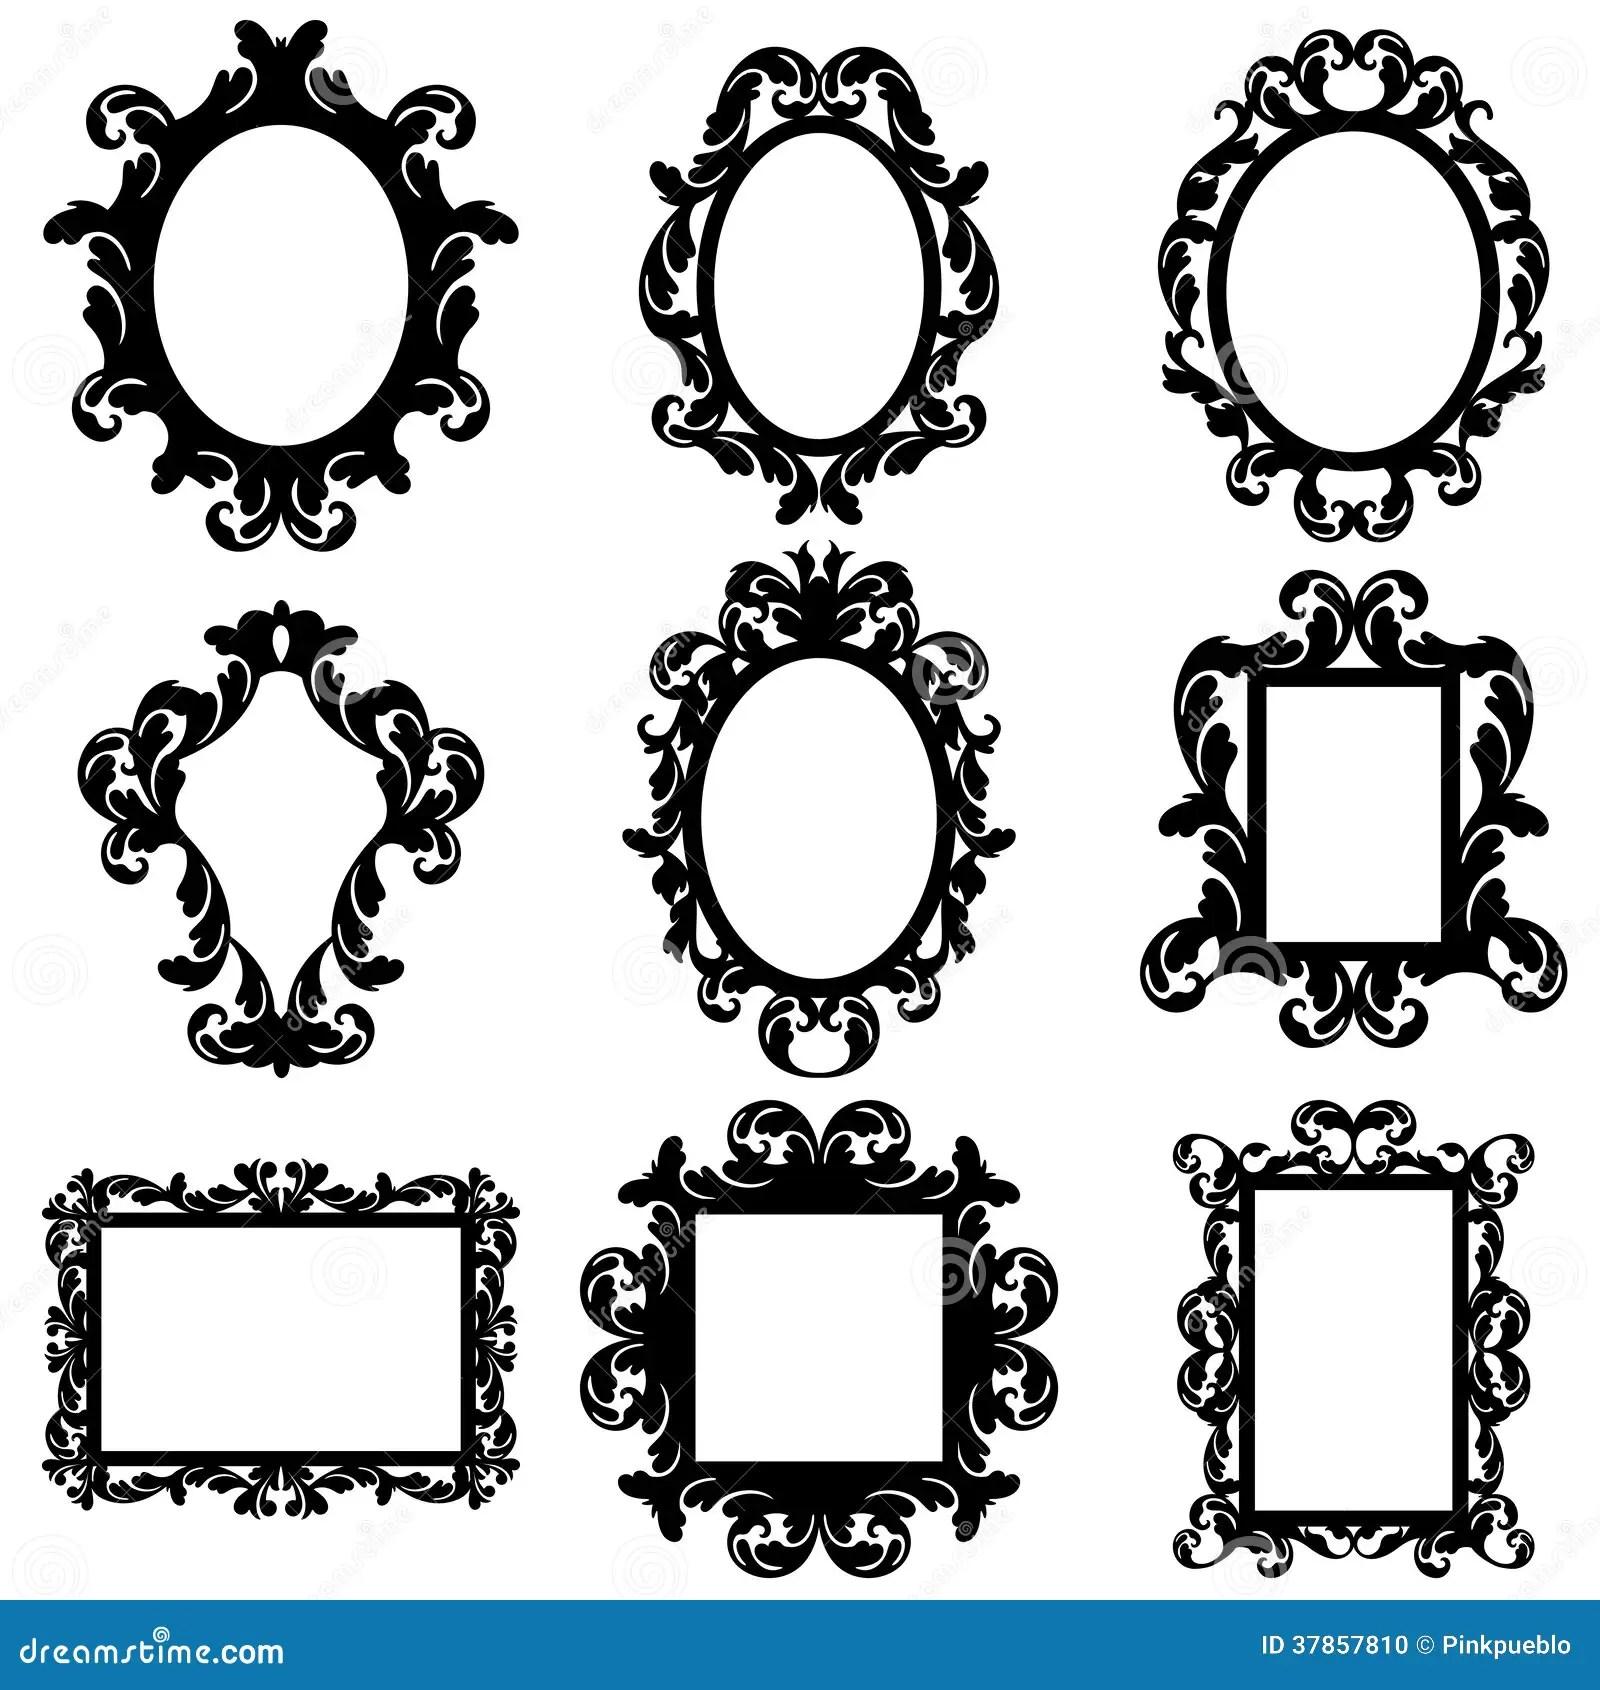 Fancy Monogram Frames Svg Silhouette